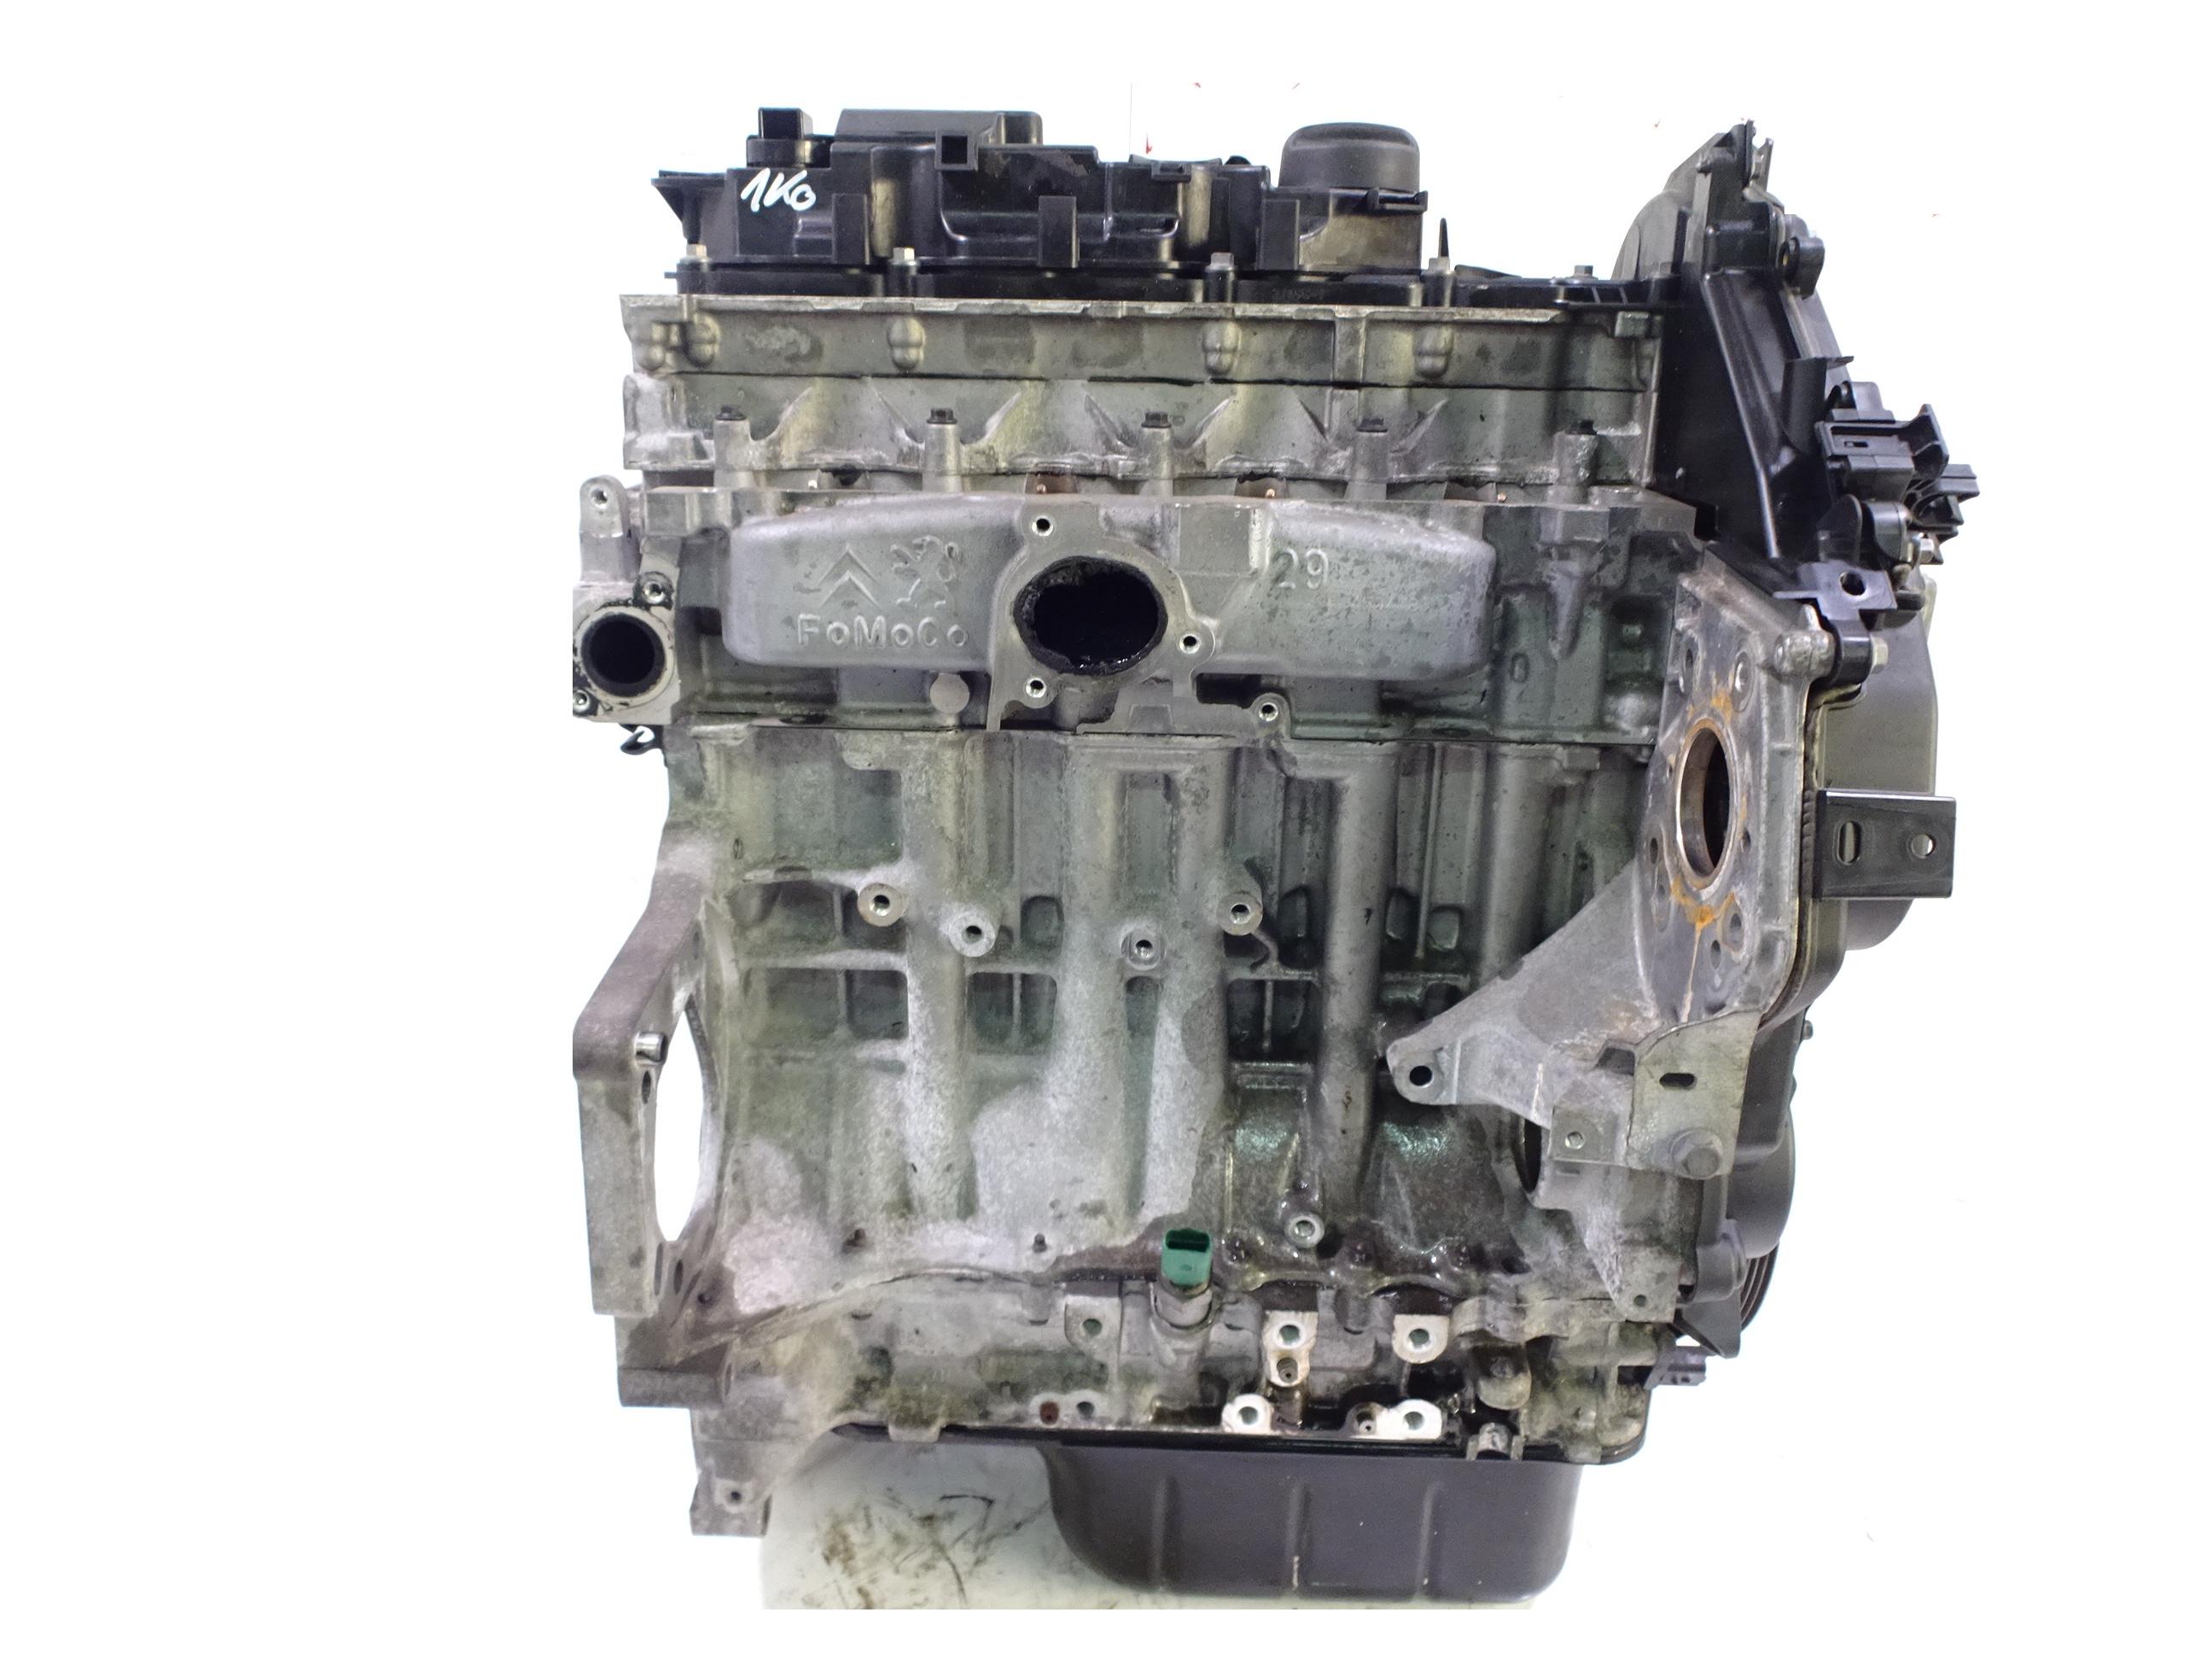 Motor 2011 Citroen C4 Picasso 1,6 HDi Diesel 9HR DV6C 9H05